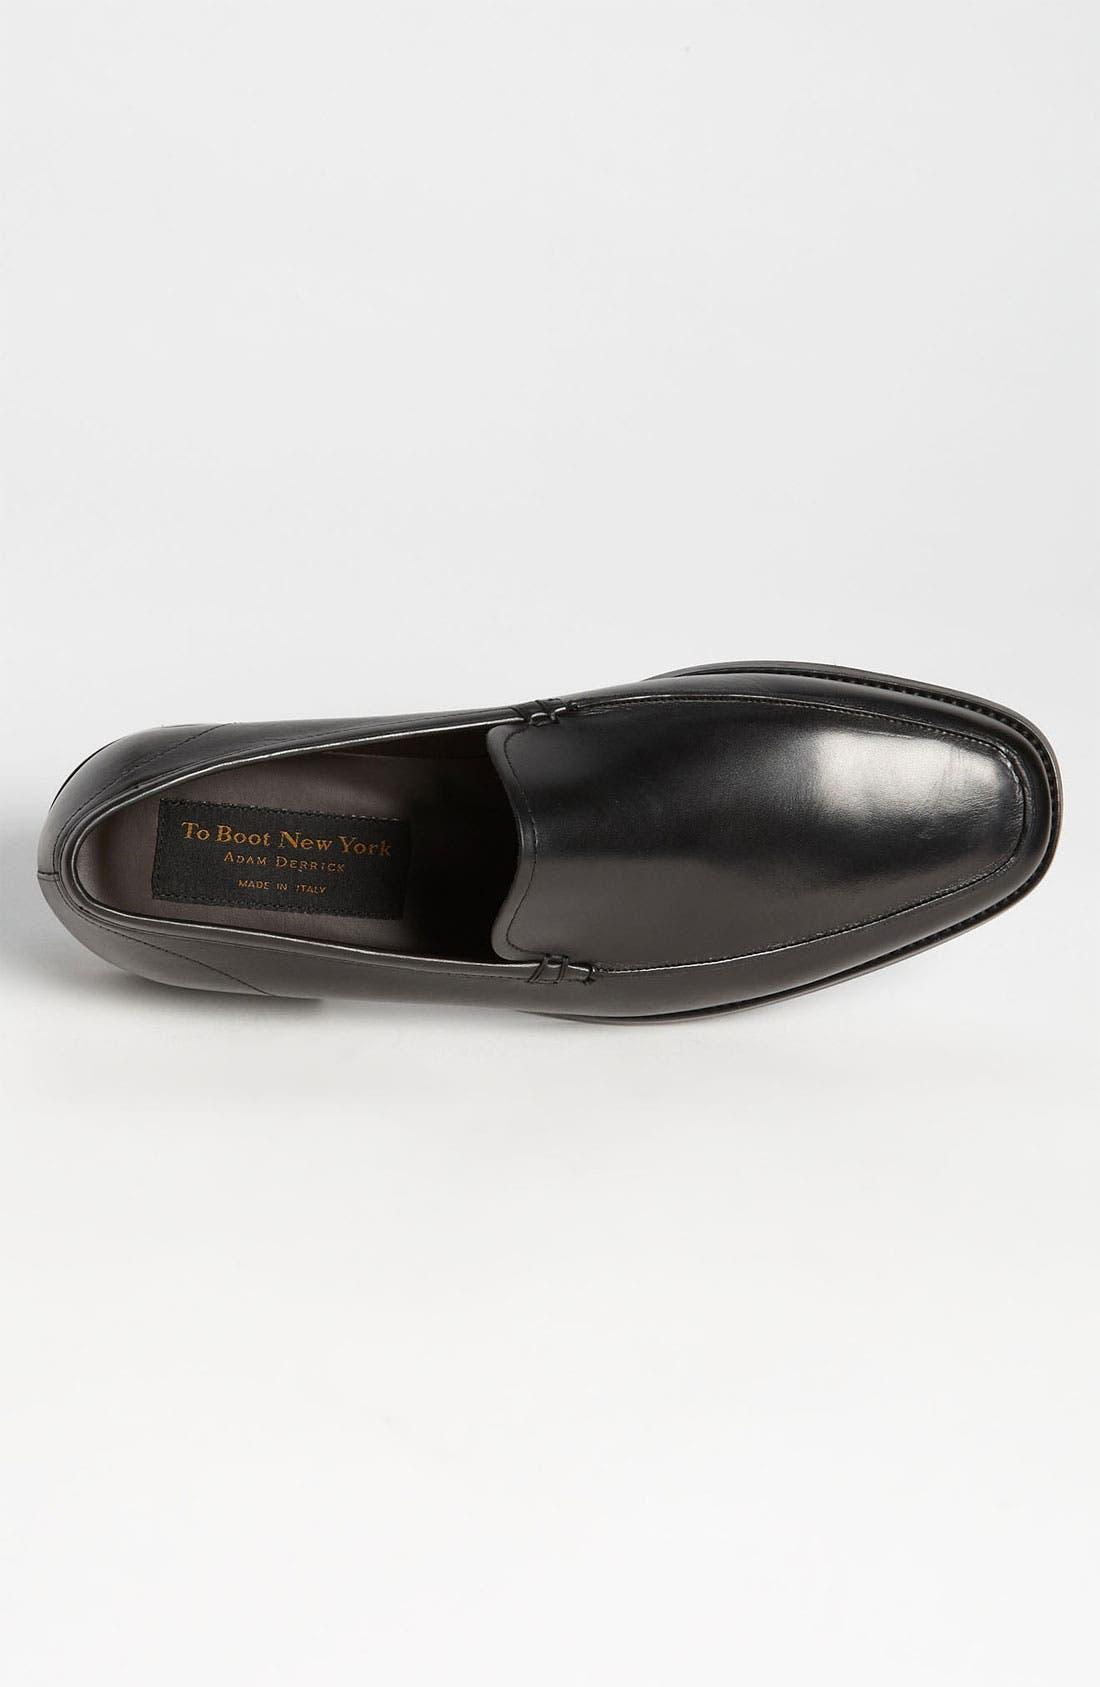 Alternate Image 3  - To Boot New York 'Franklin' Moc-Toe Loafer